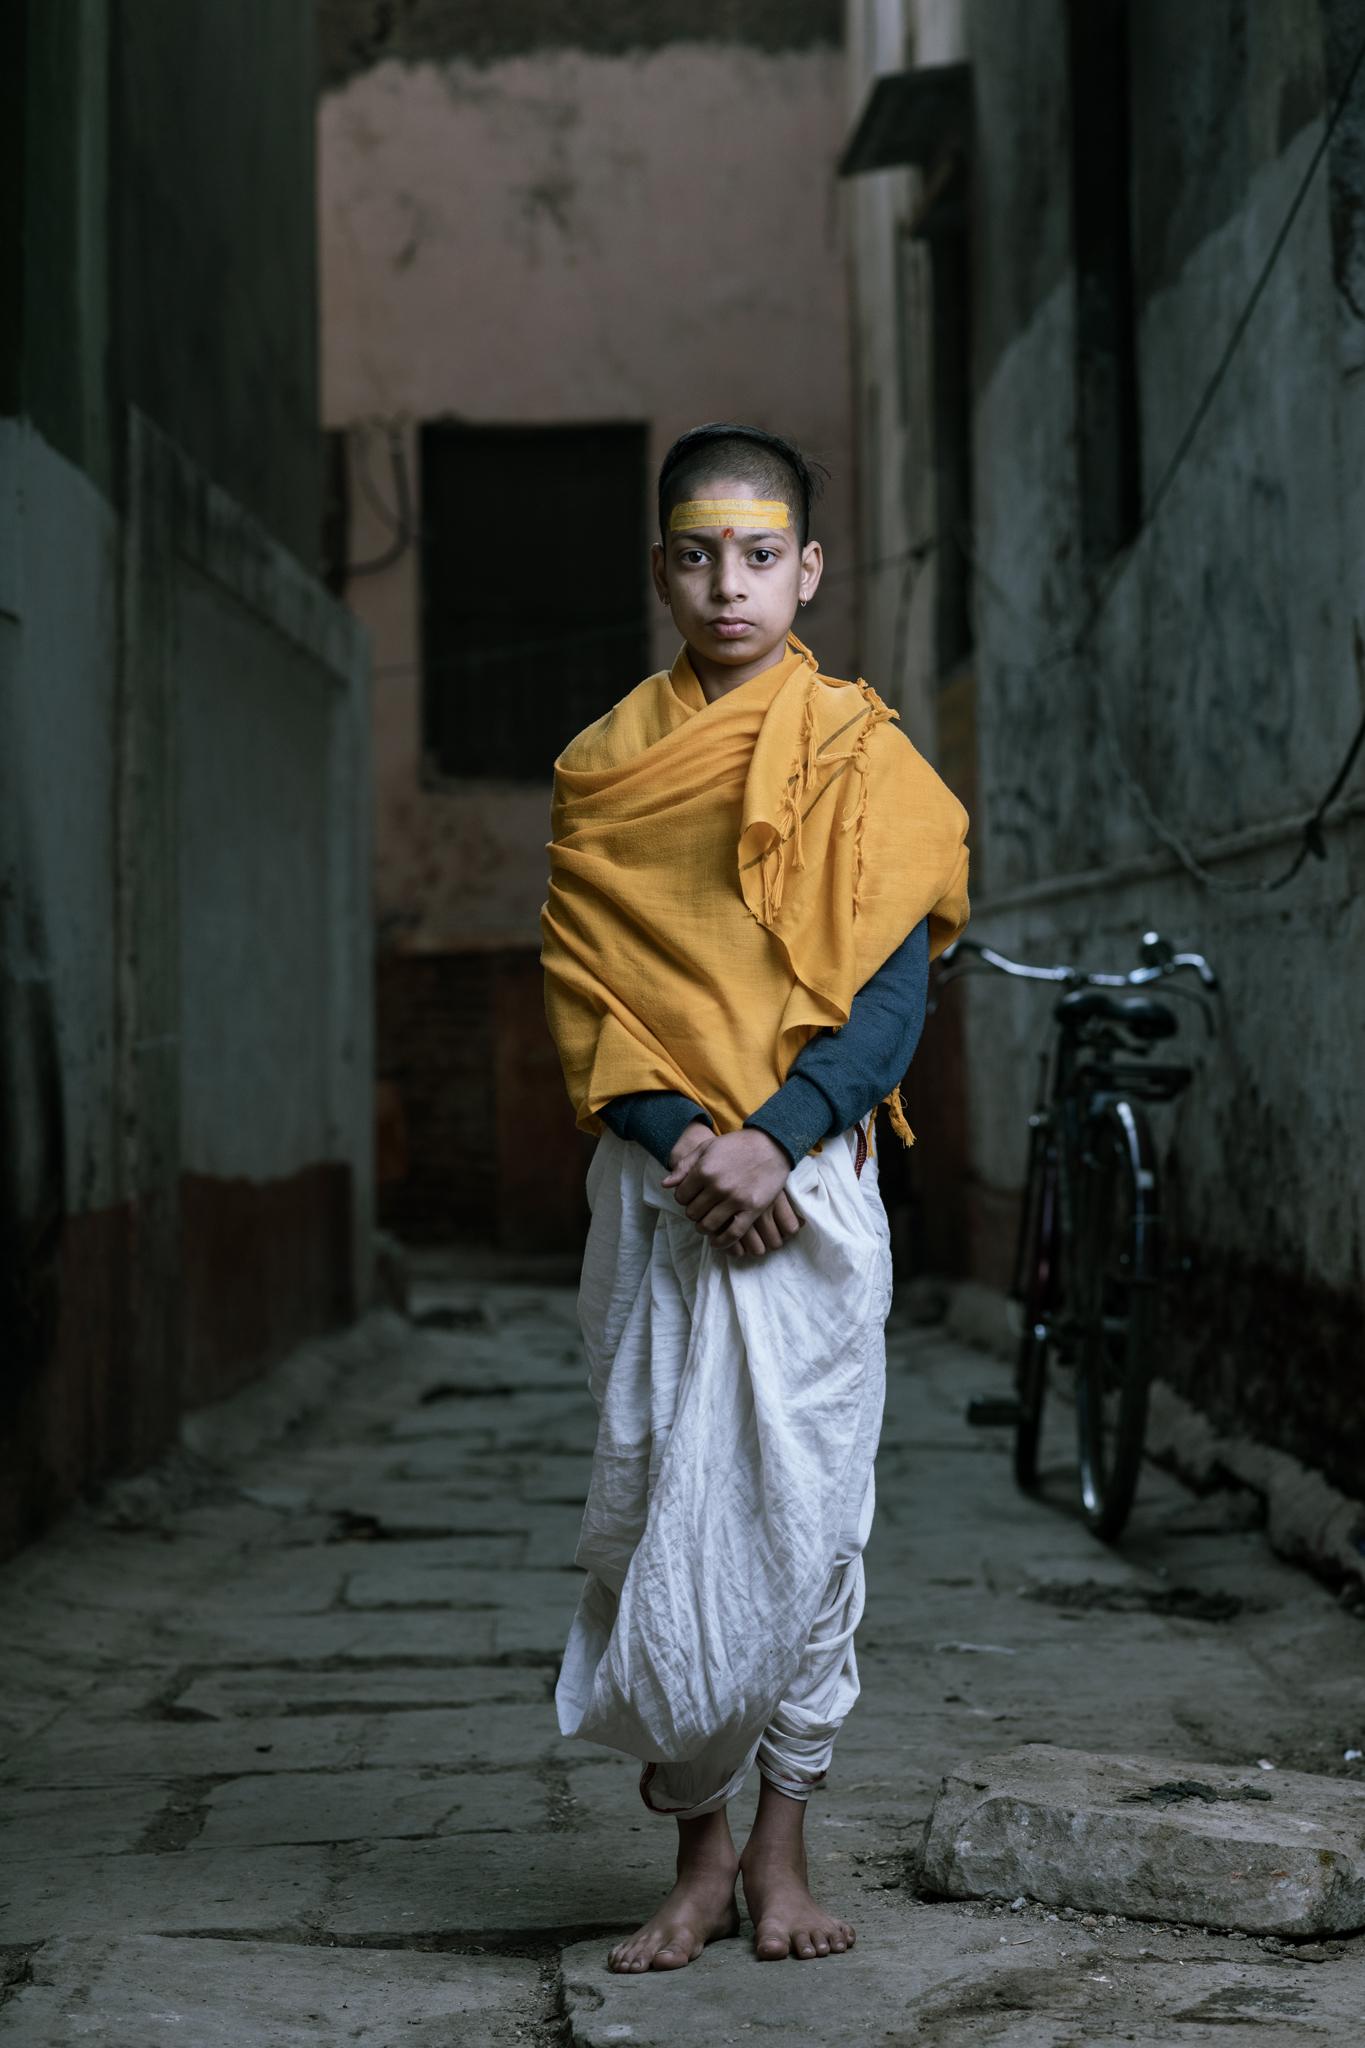 Varanasi_portrait_travel_photography_Manchester_Adventure_Photographer_Jan_Bella23.jpg